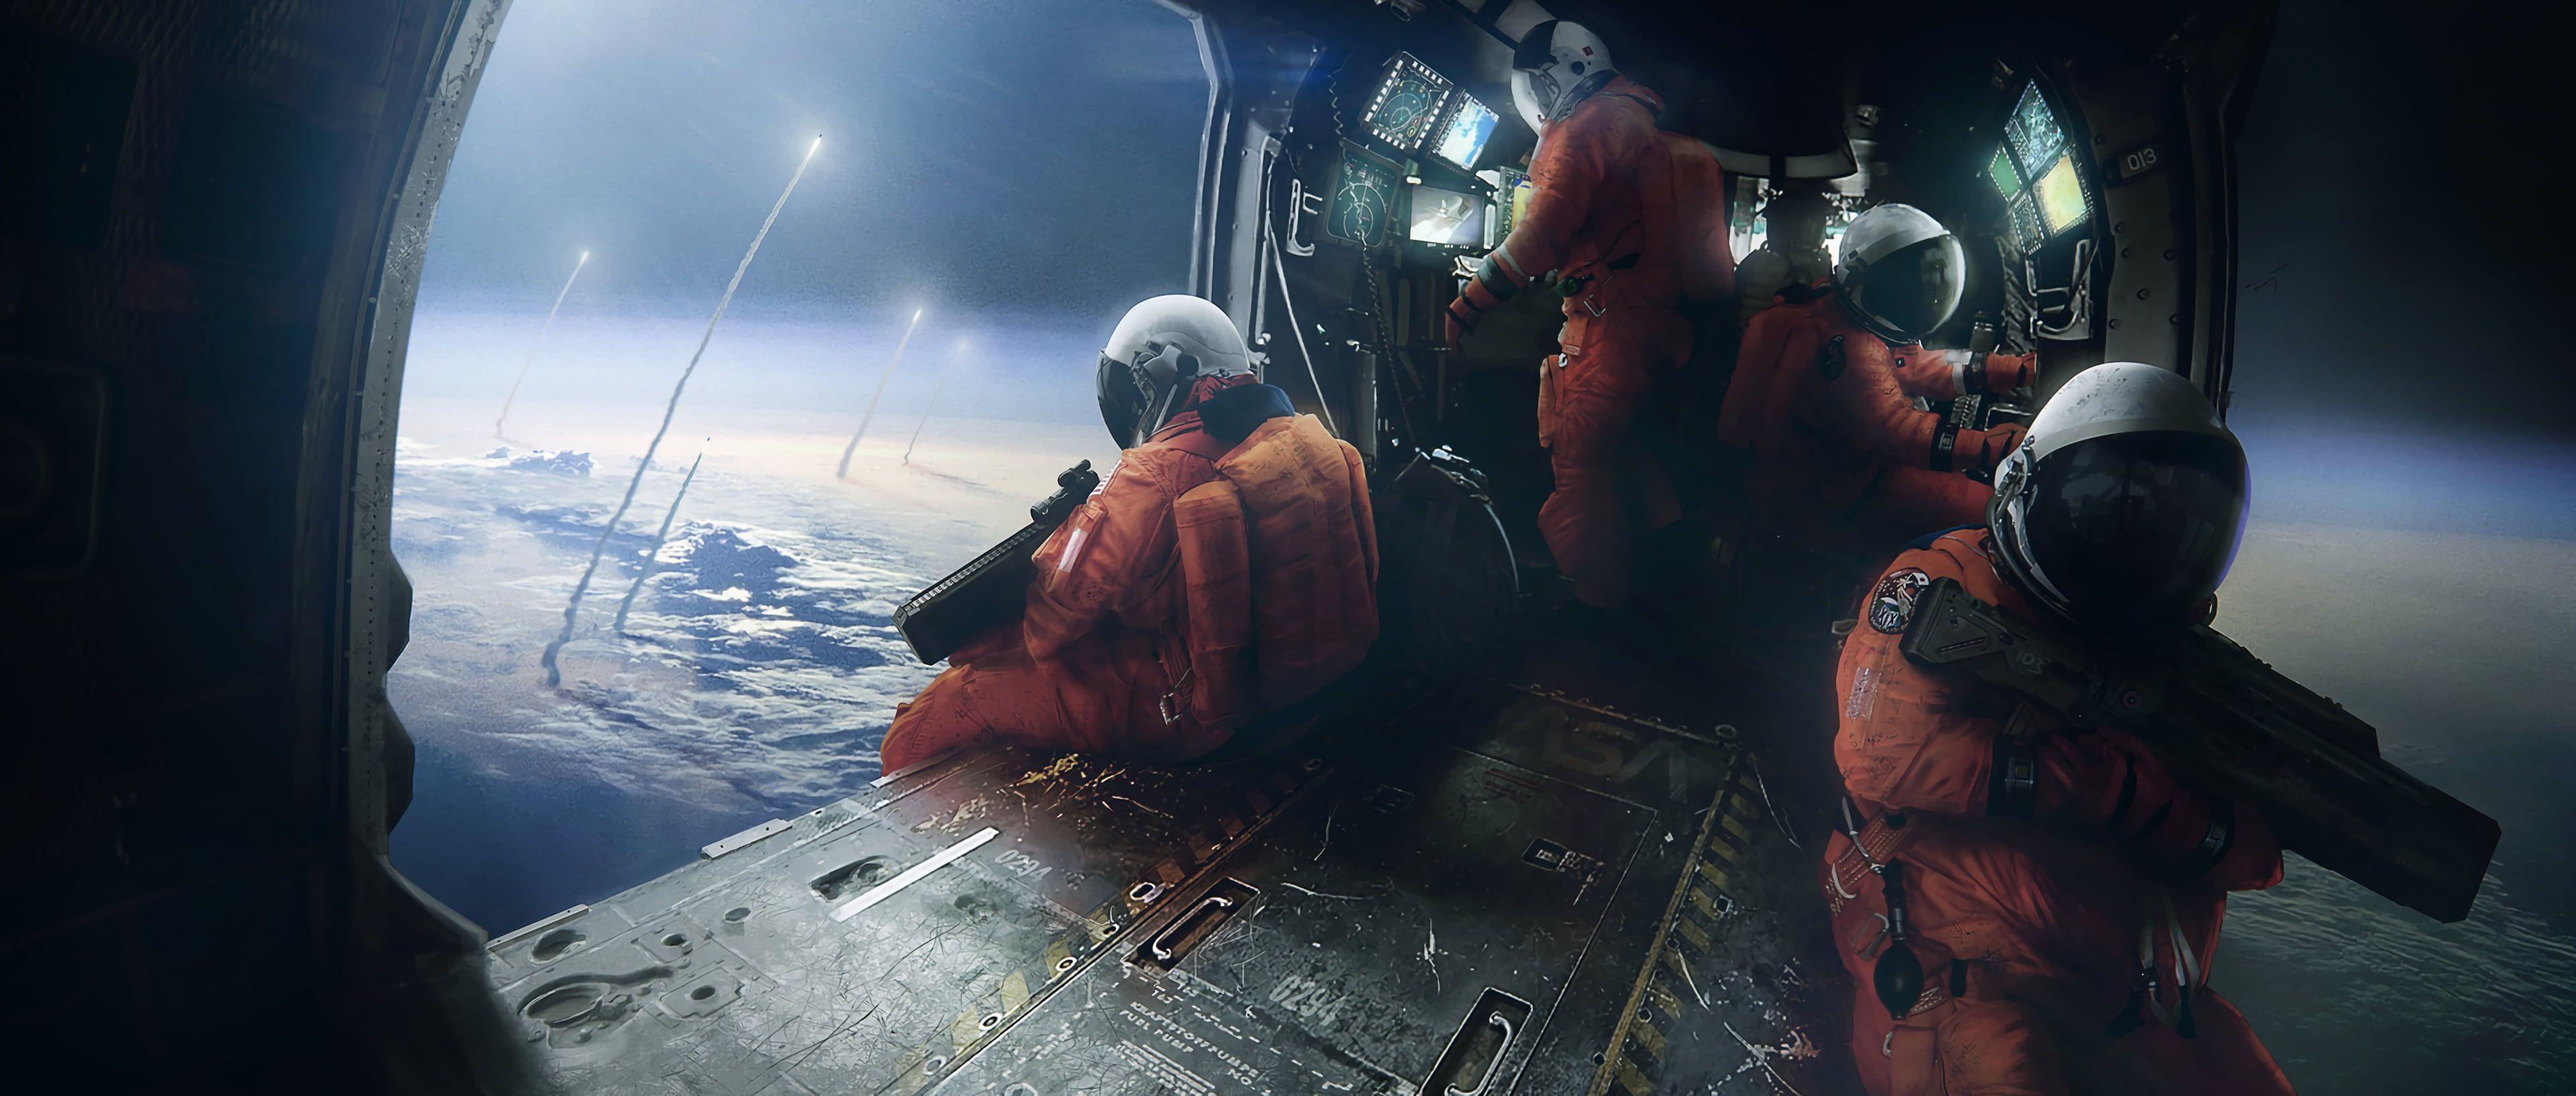 Astronauts Wallpaper Science Fiction Space 4k Wallpaper Hdwallpaper Desktop In 2020 Digital Painting Astronaut Wallpaper Painting Inspiration